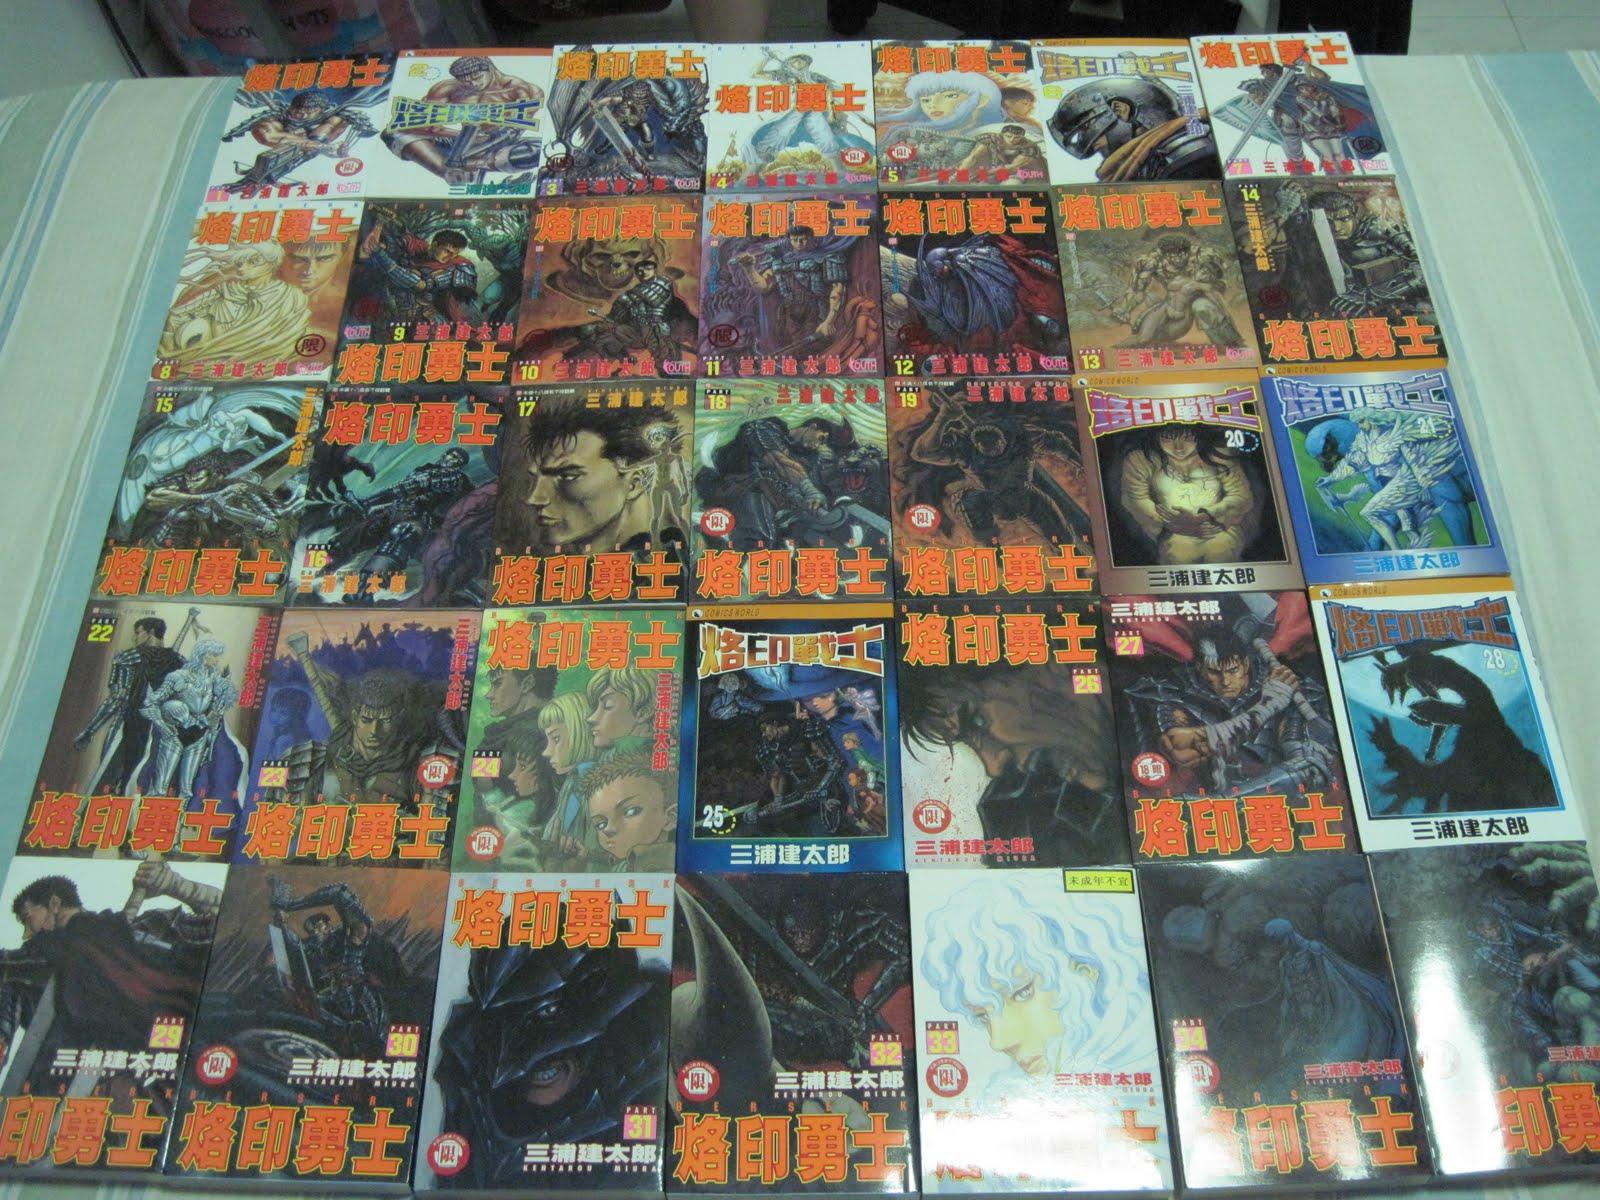 My berserk manga collection